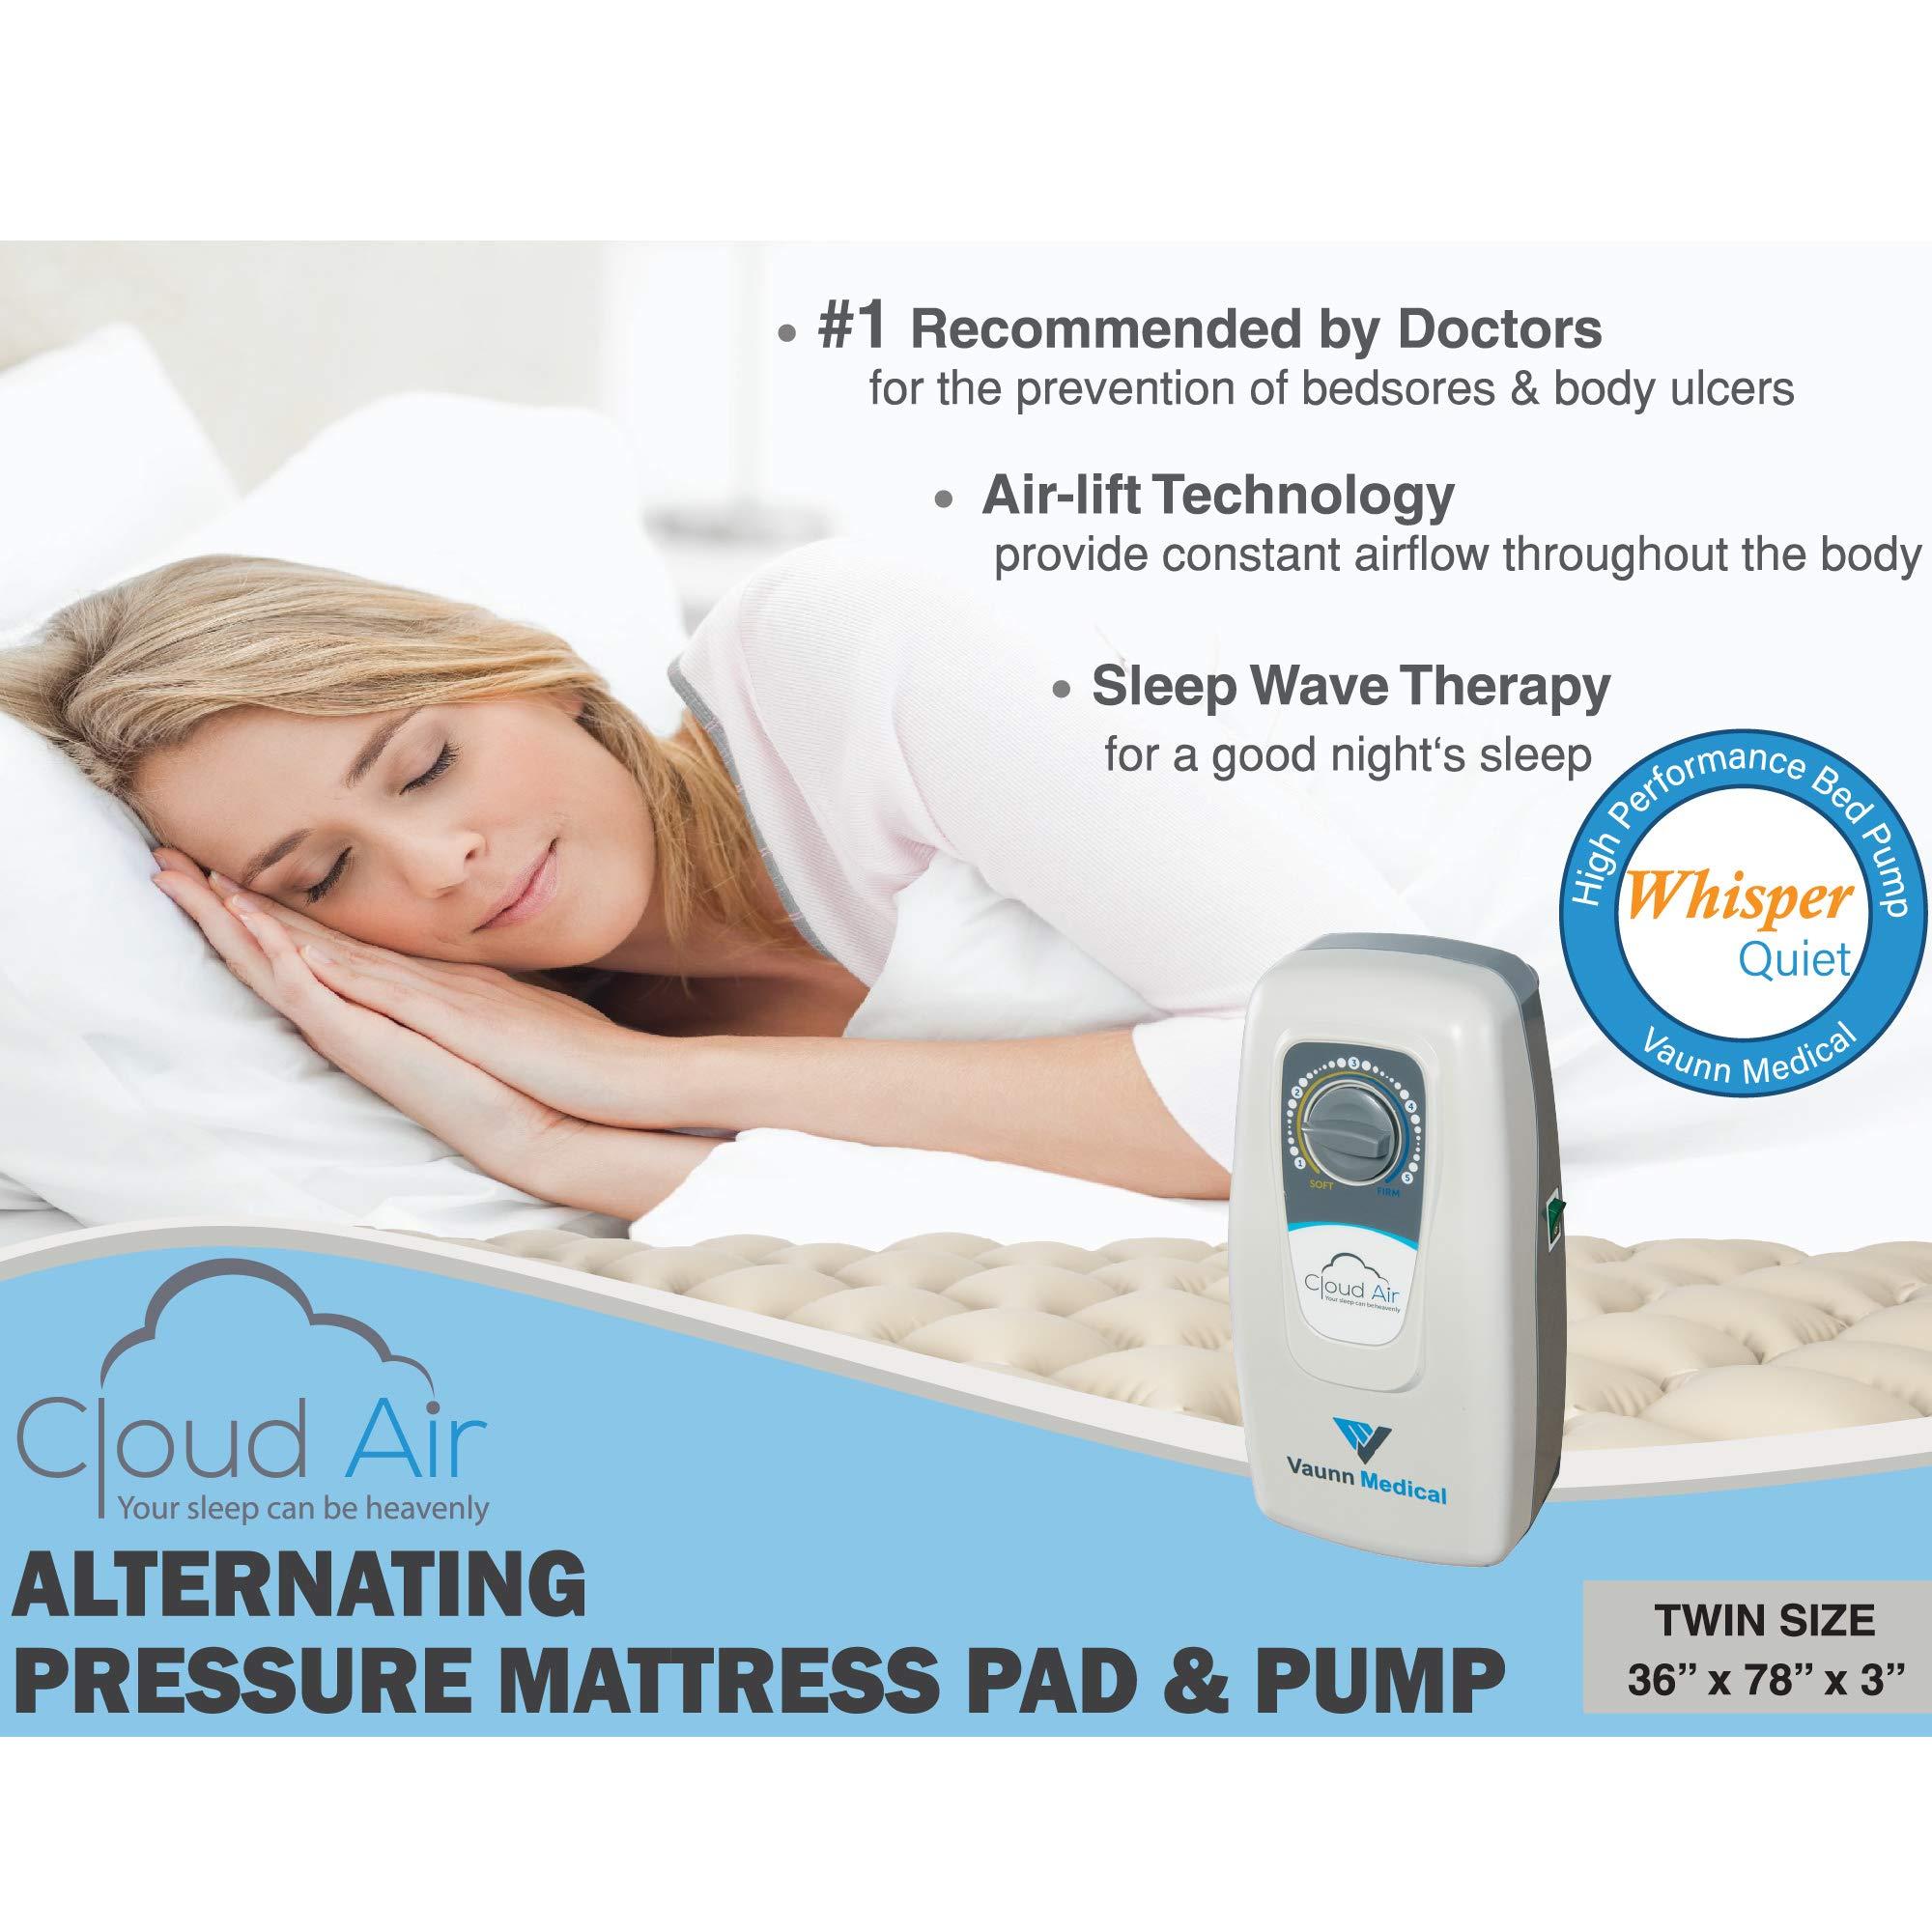 Vaunn Medical Cloud Air Whisper Quiet Alternating Air Pressure Mattress Topper with Pump (2018 Upgraded